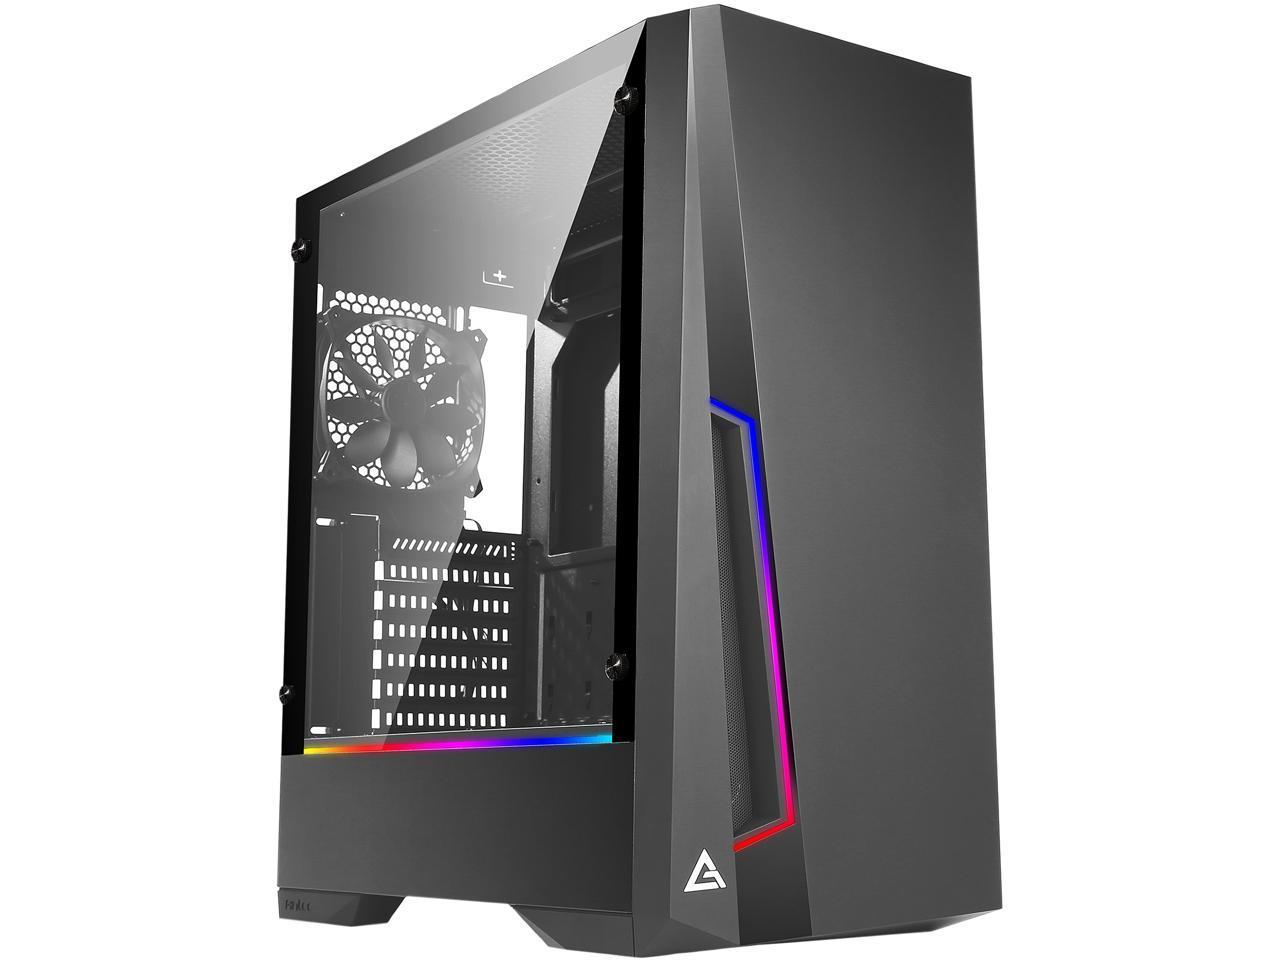 Antec Dark Phantom DP501 Tempered Glass ARGB Mid Tower Gaming Case $42AR @Newegg (also 650W HGC650 80+ Gold Modular PSU $75AR)